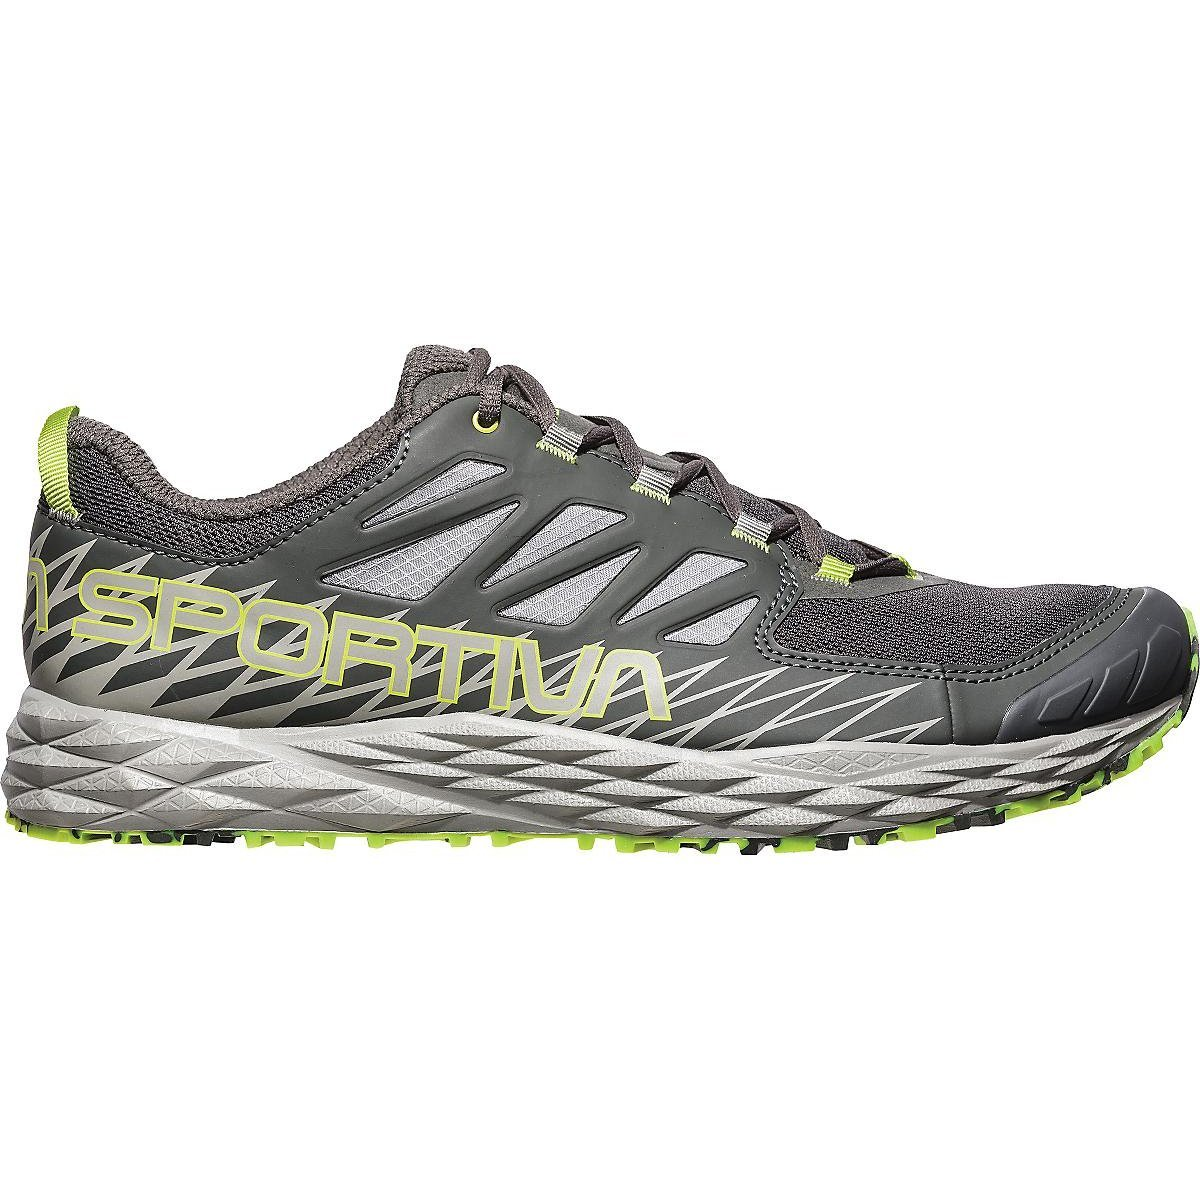 La Sportiva Lycan Running Shoe - Men's B07214JQJH 44 M EU|Carbon/Apple Green